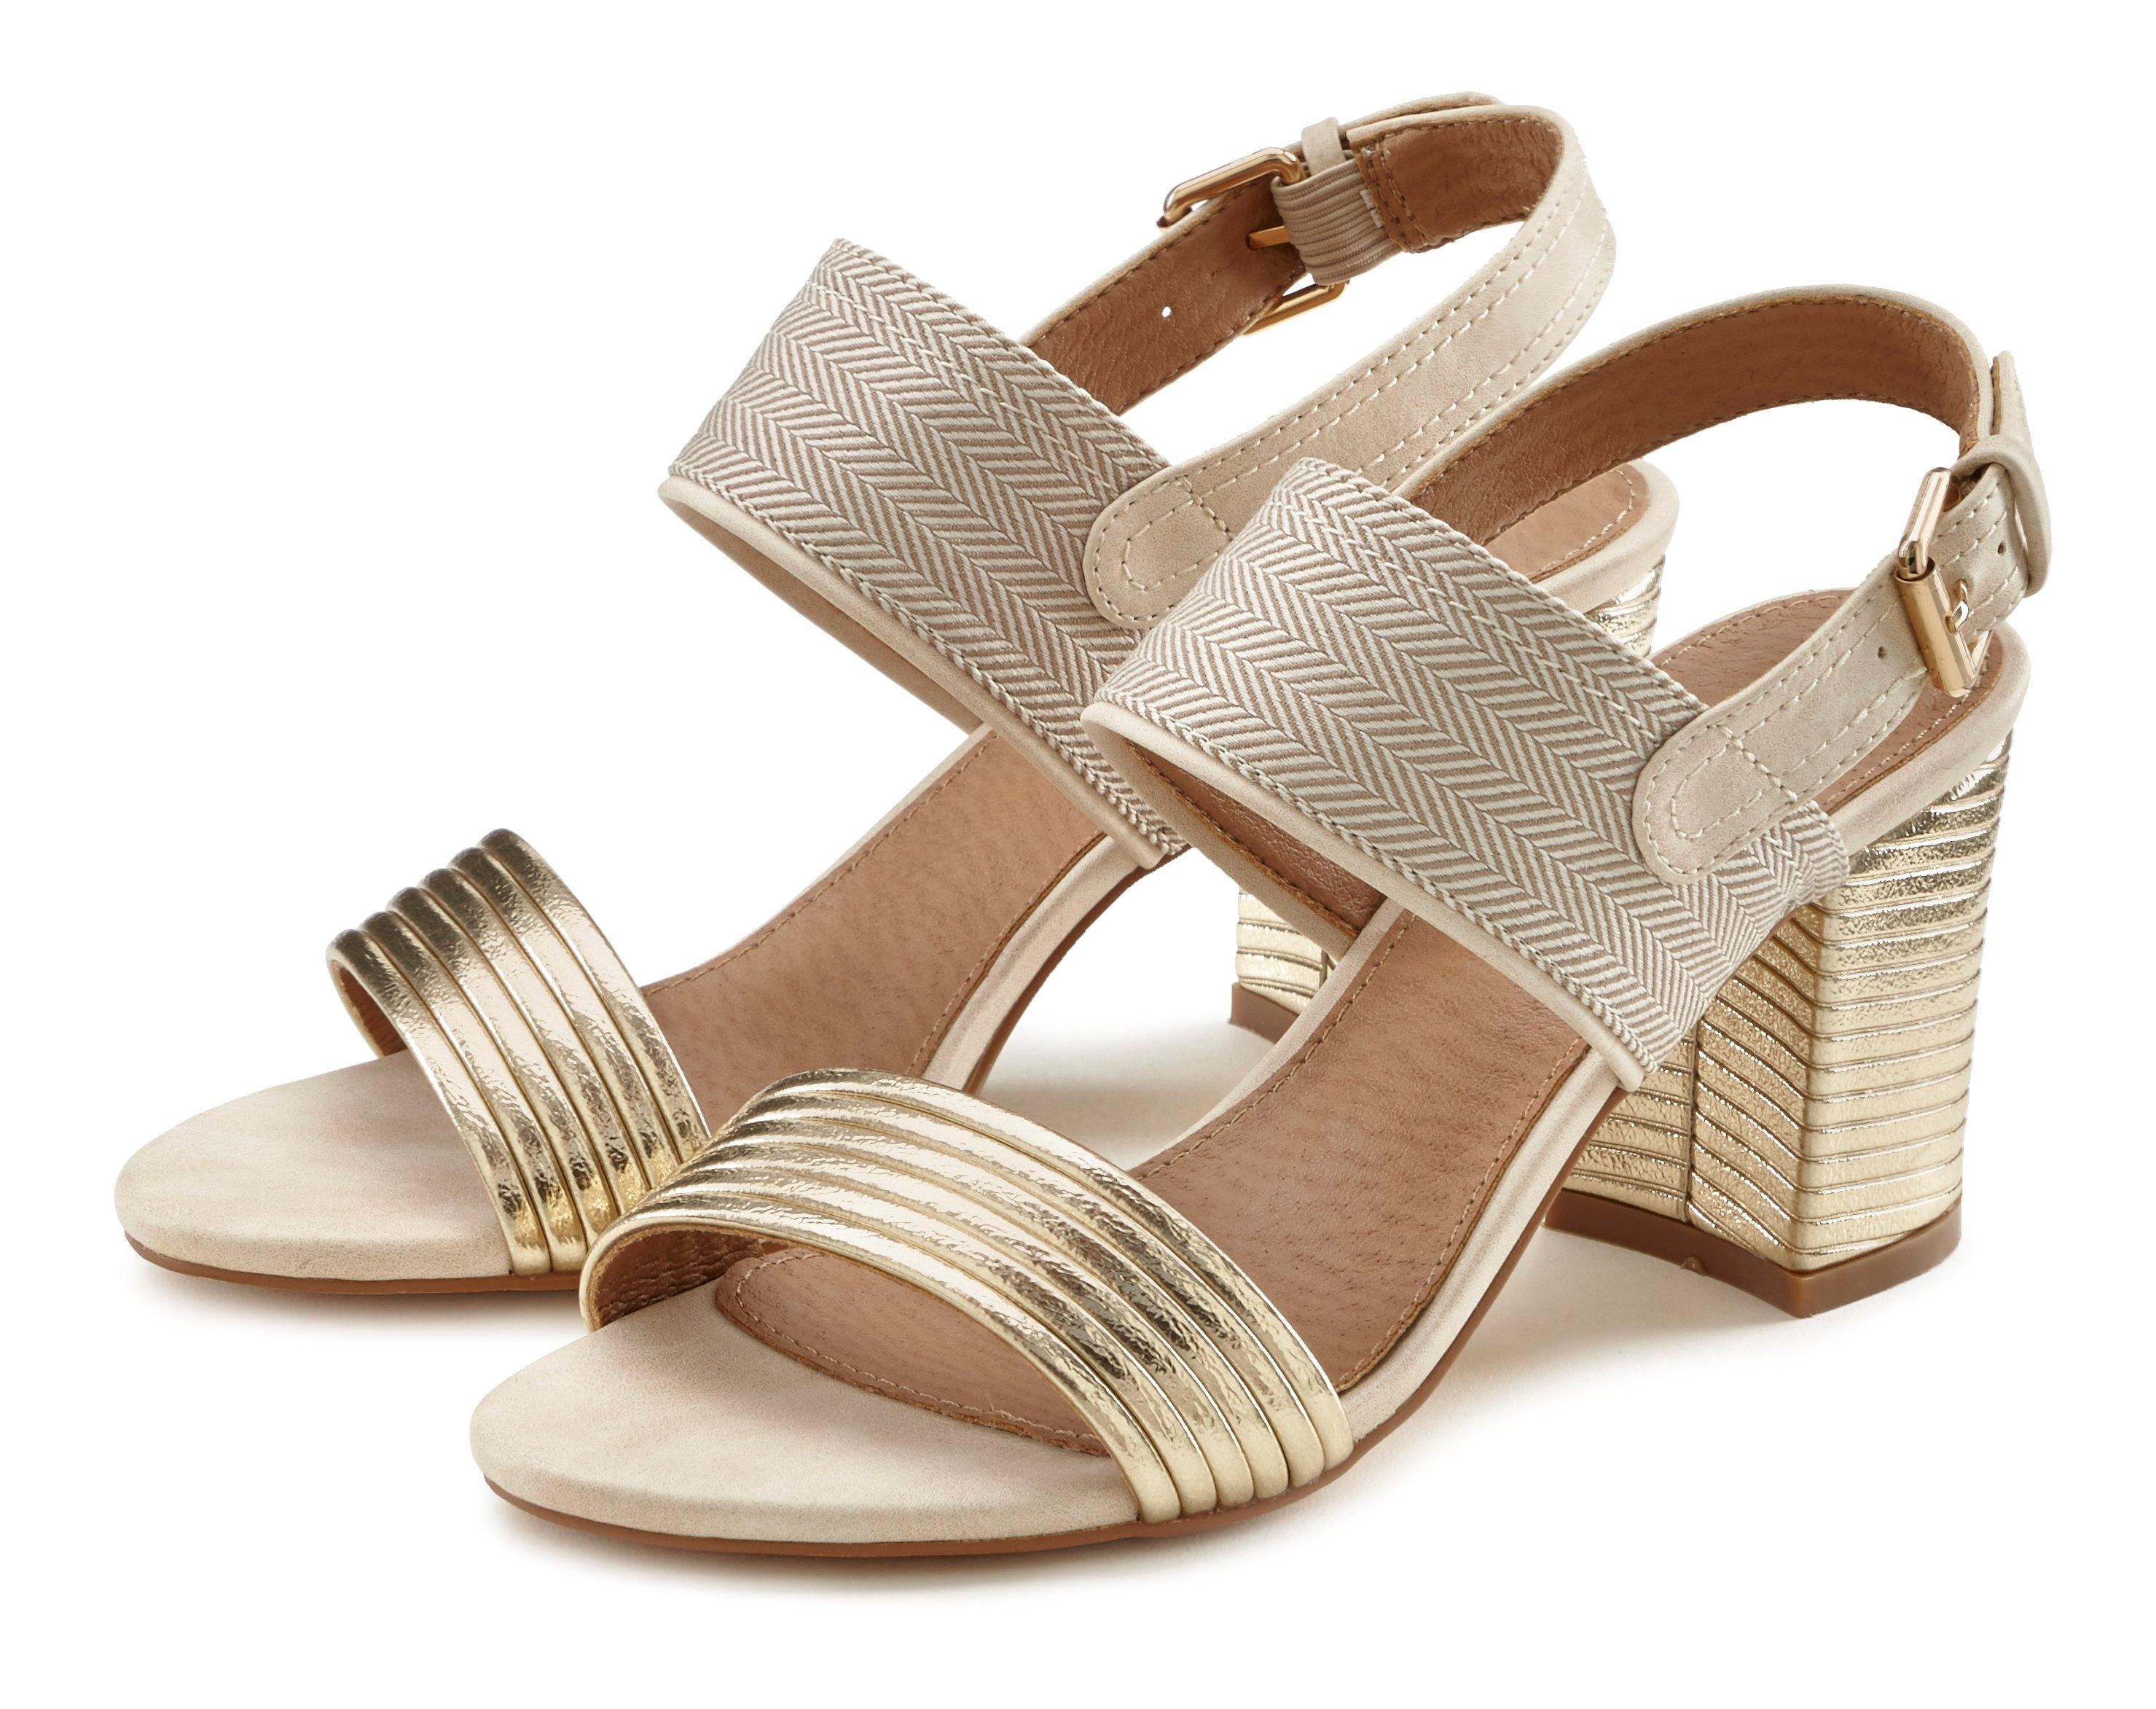 LASCANA sandaaltjes online kopen op lascana.nl